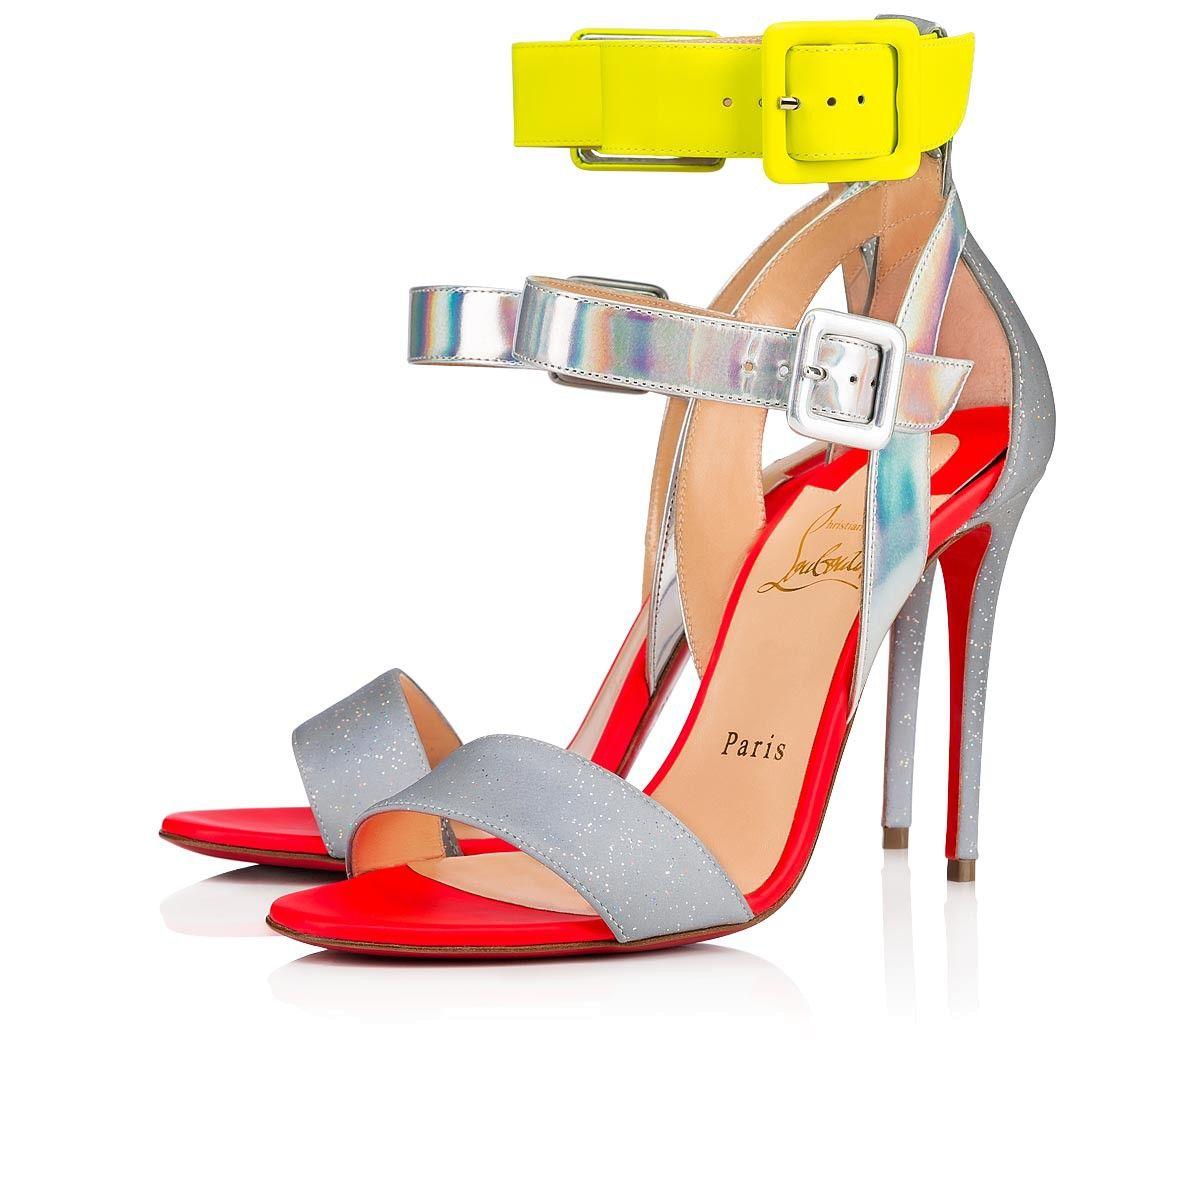 973ee62205f Multipot 100 Version Multi Fluo Matte - Women Shoes - Christian ...